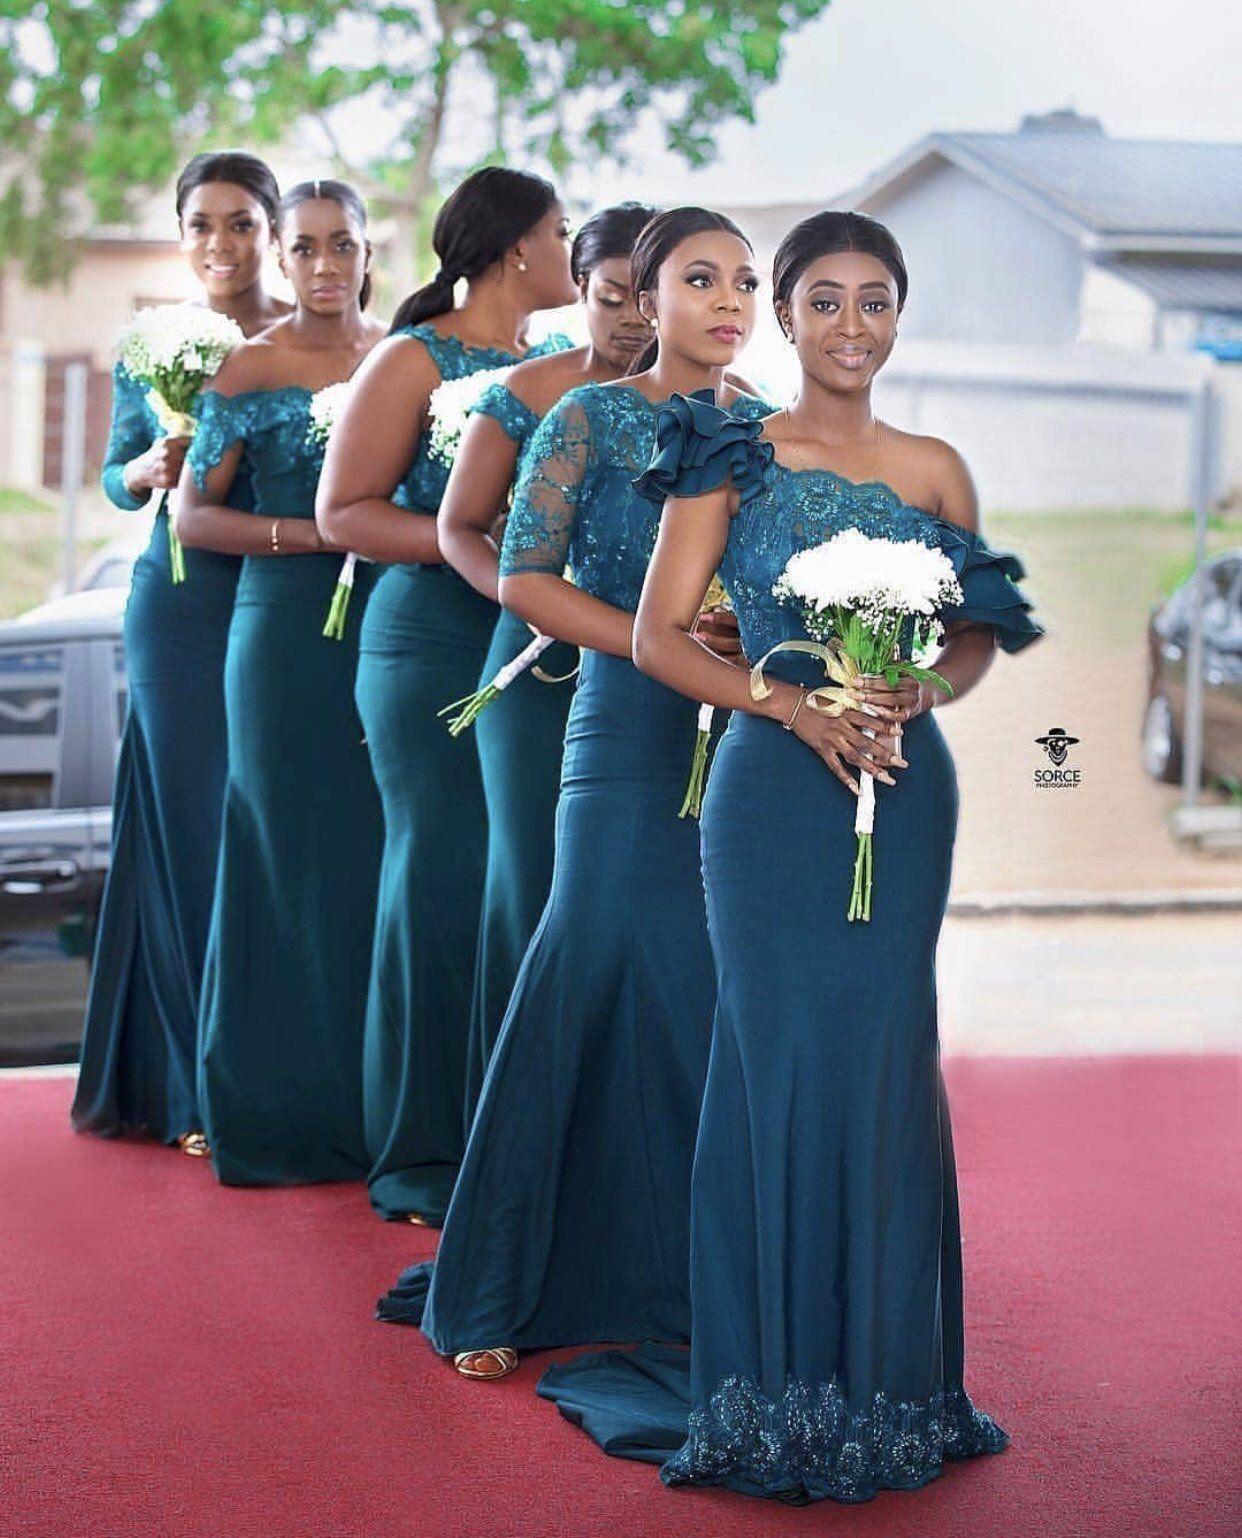 Vho Linah On Twitter Teal Bridesmaid Dresses Mermaid Bridesmaid Dresses Green Bridesmaid Dresses